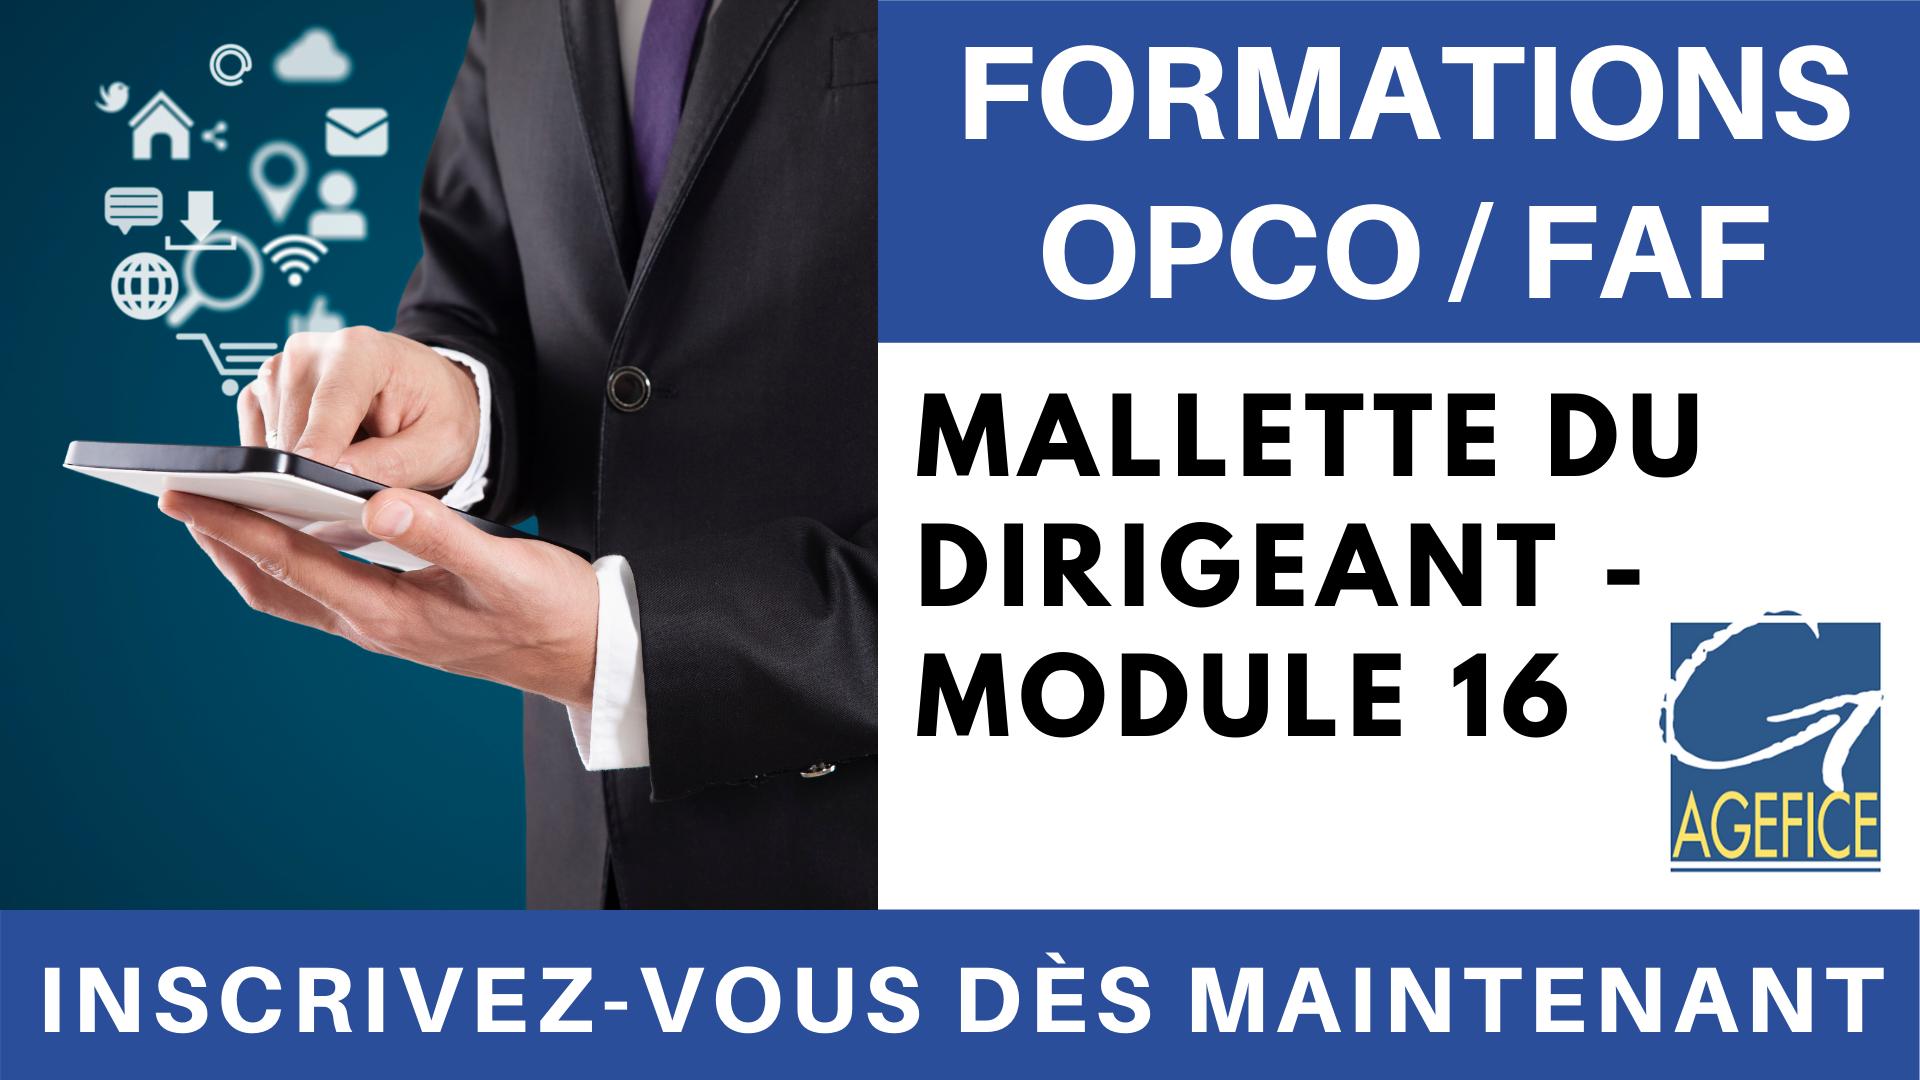 Vidéo - Formation OPCO_FAF Mallette du dirigeant mod 16